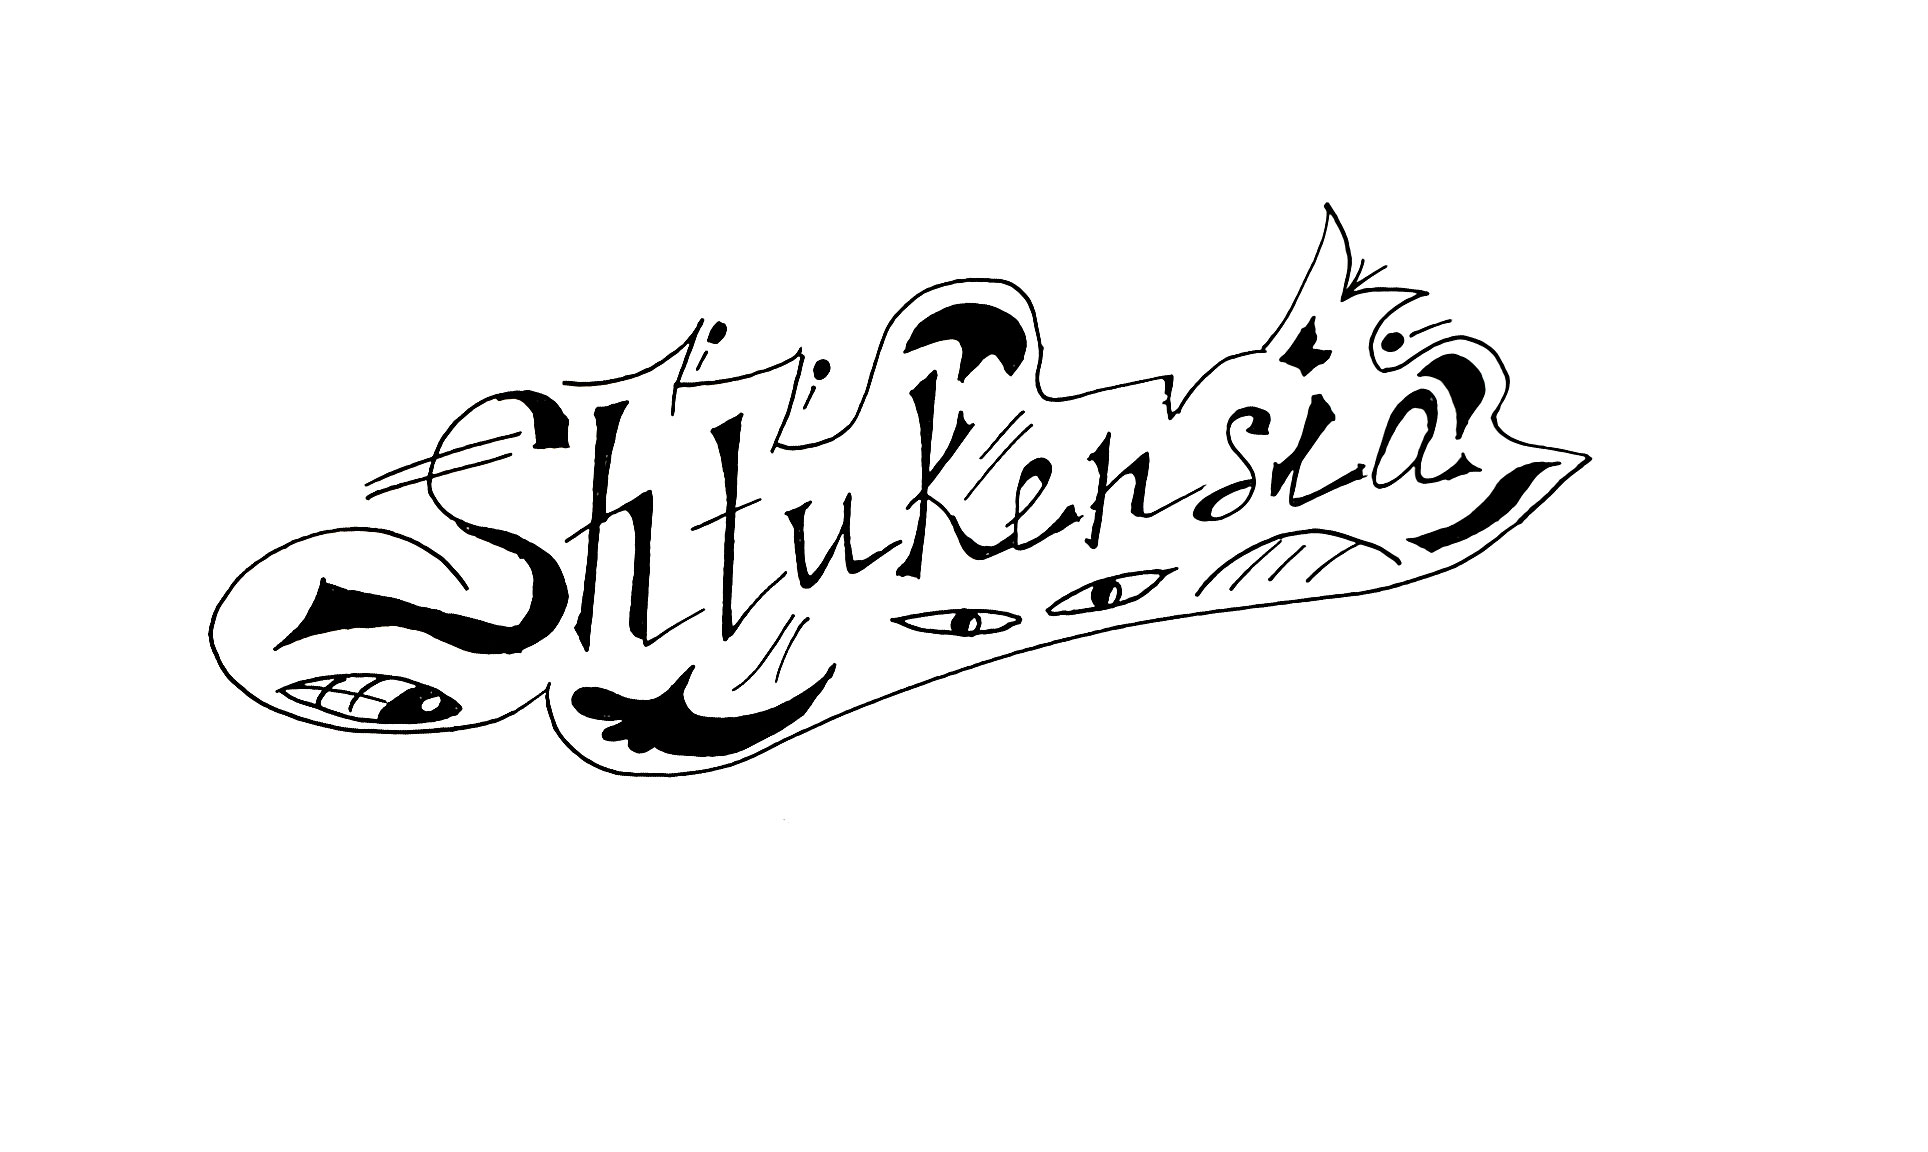 shtukensia-hand-font